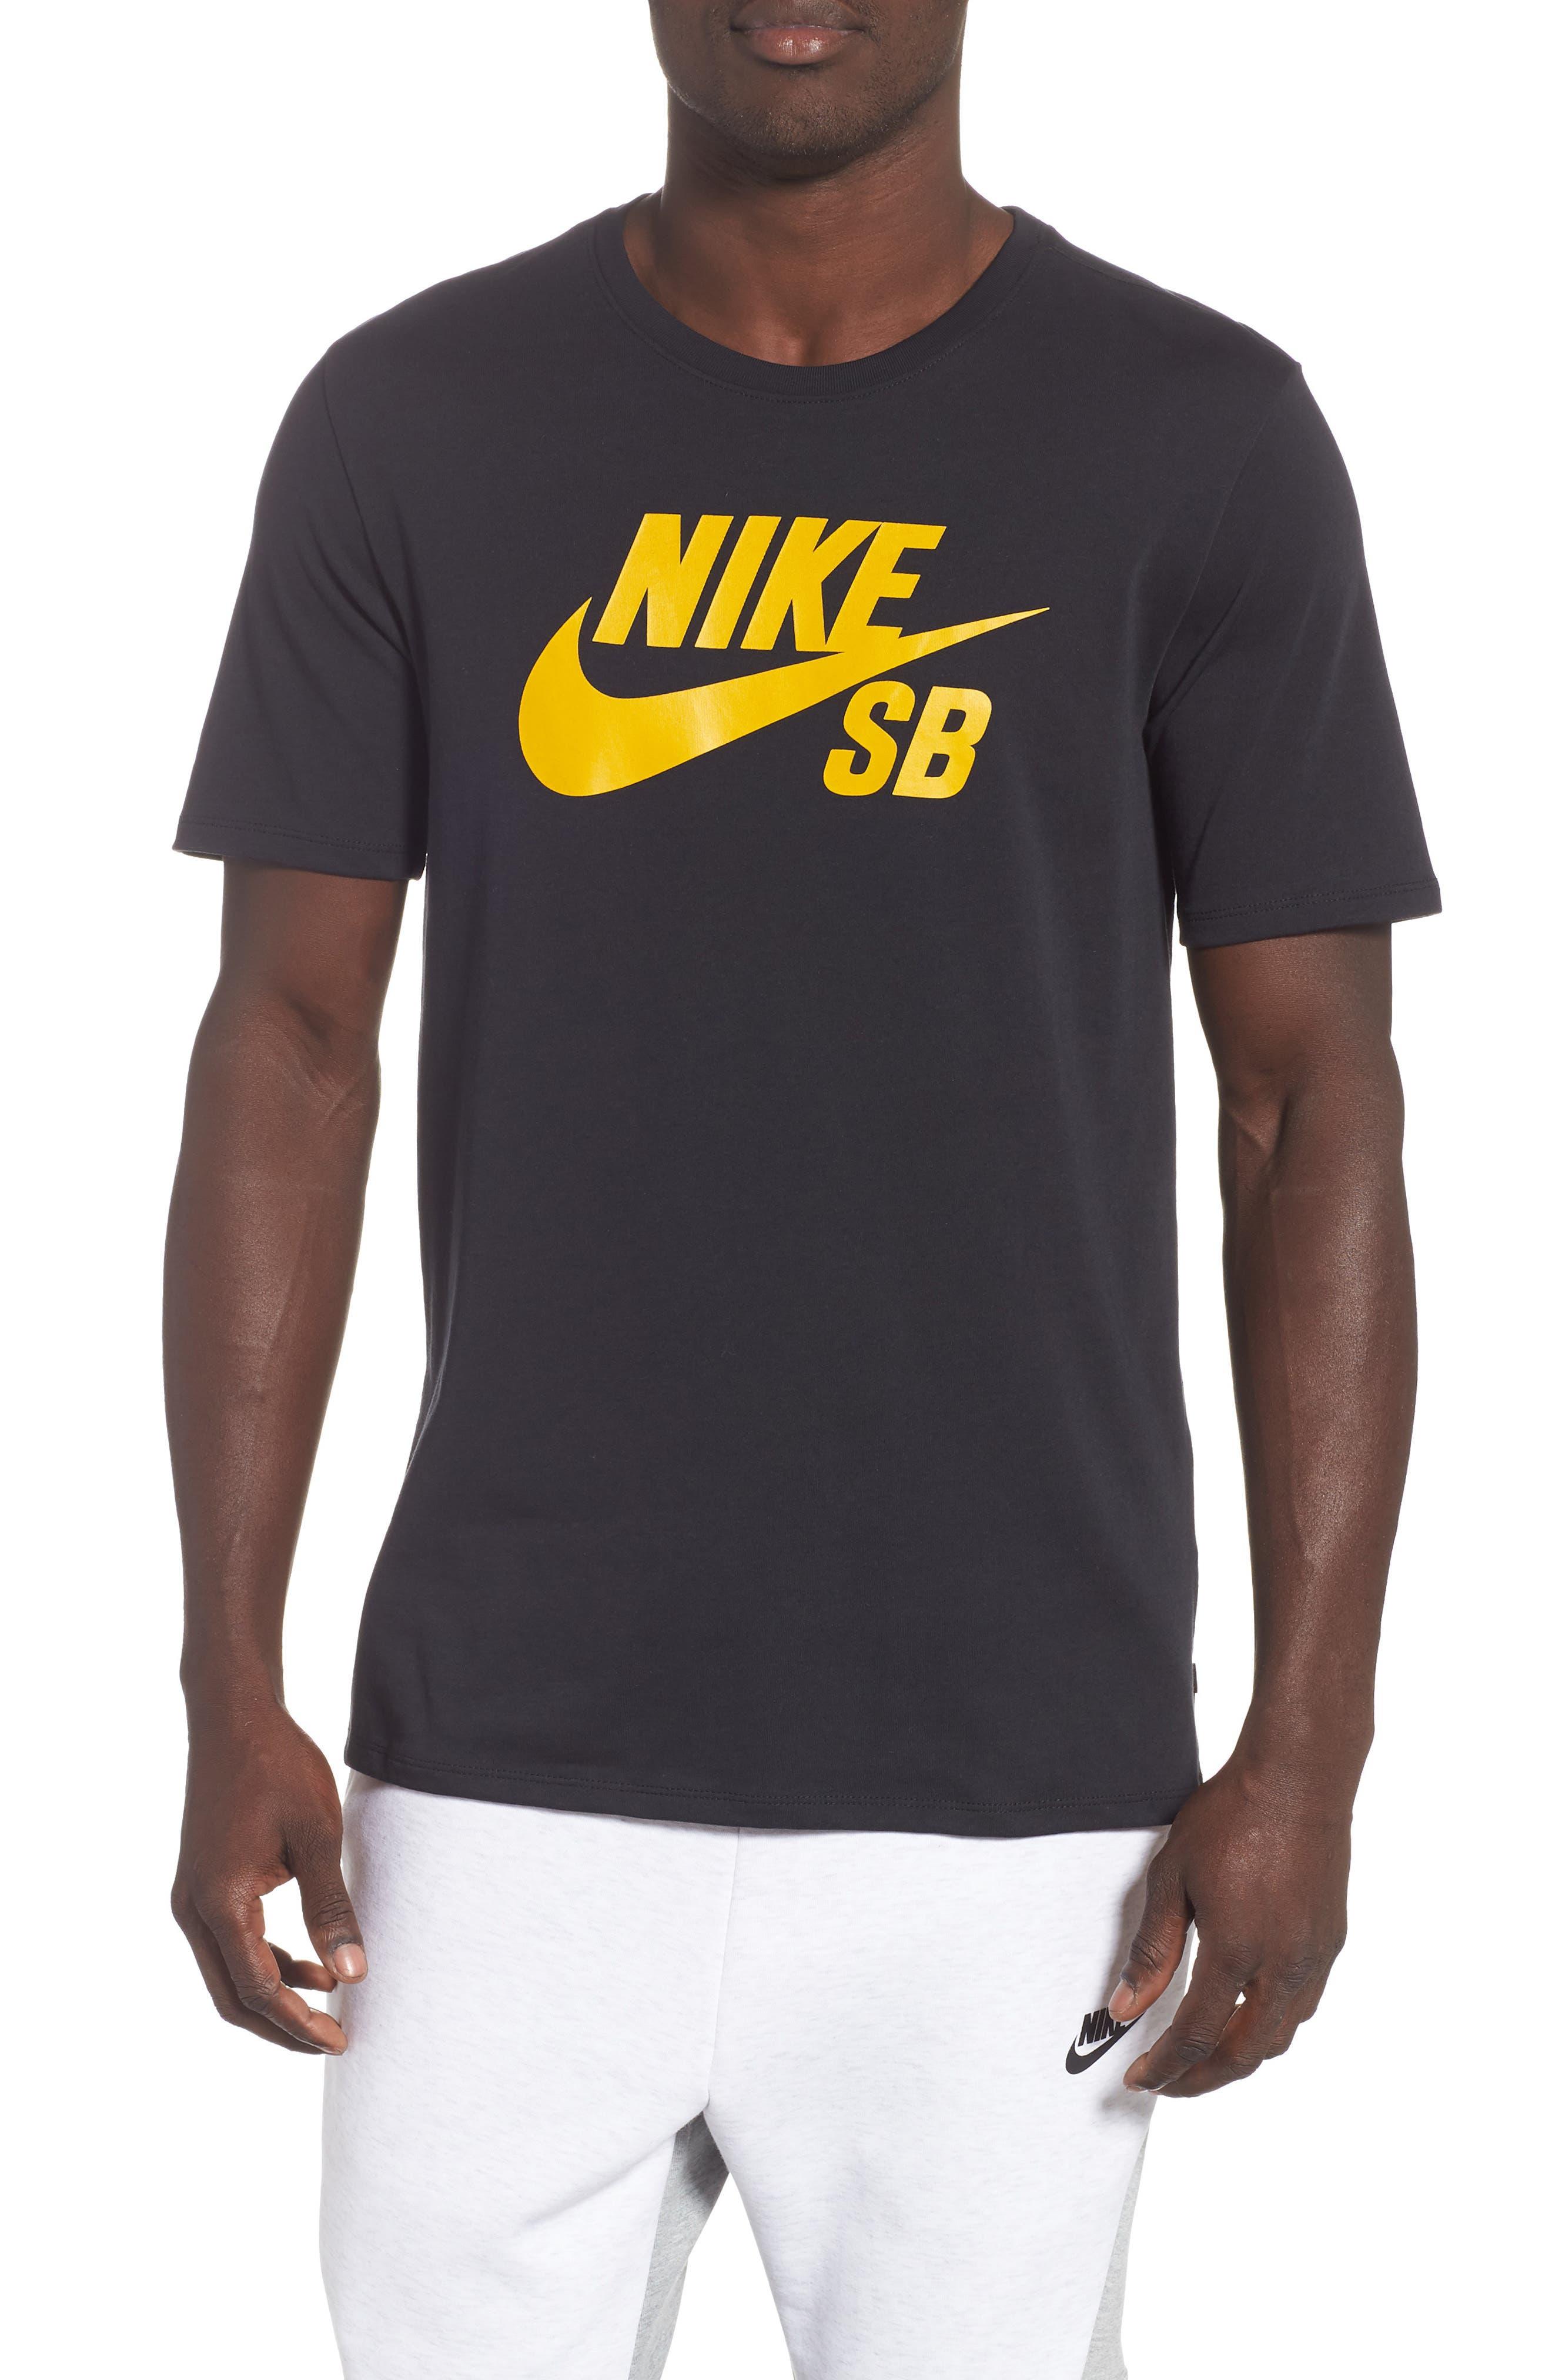 NIKE SB Nike 'SB Logo' T-Shirt, Main, color, 019